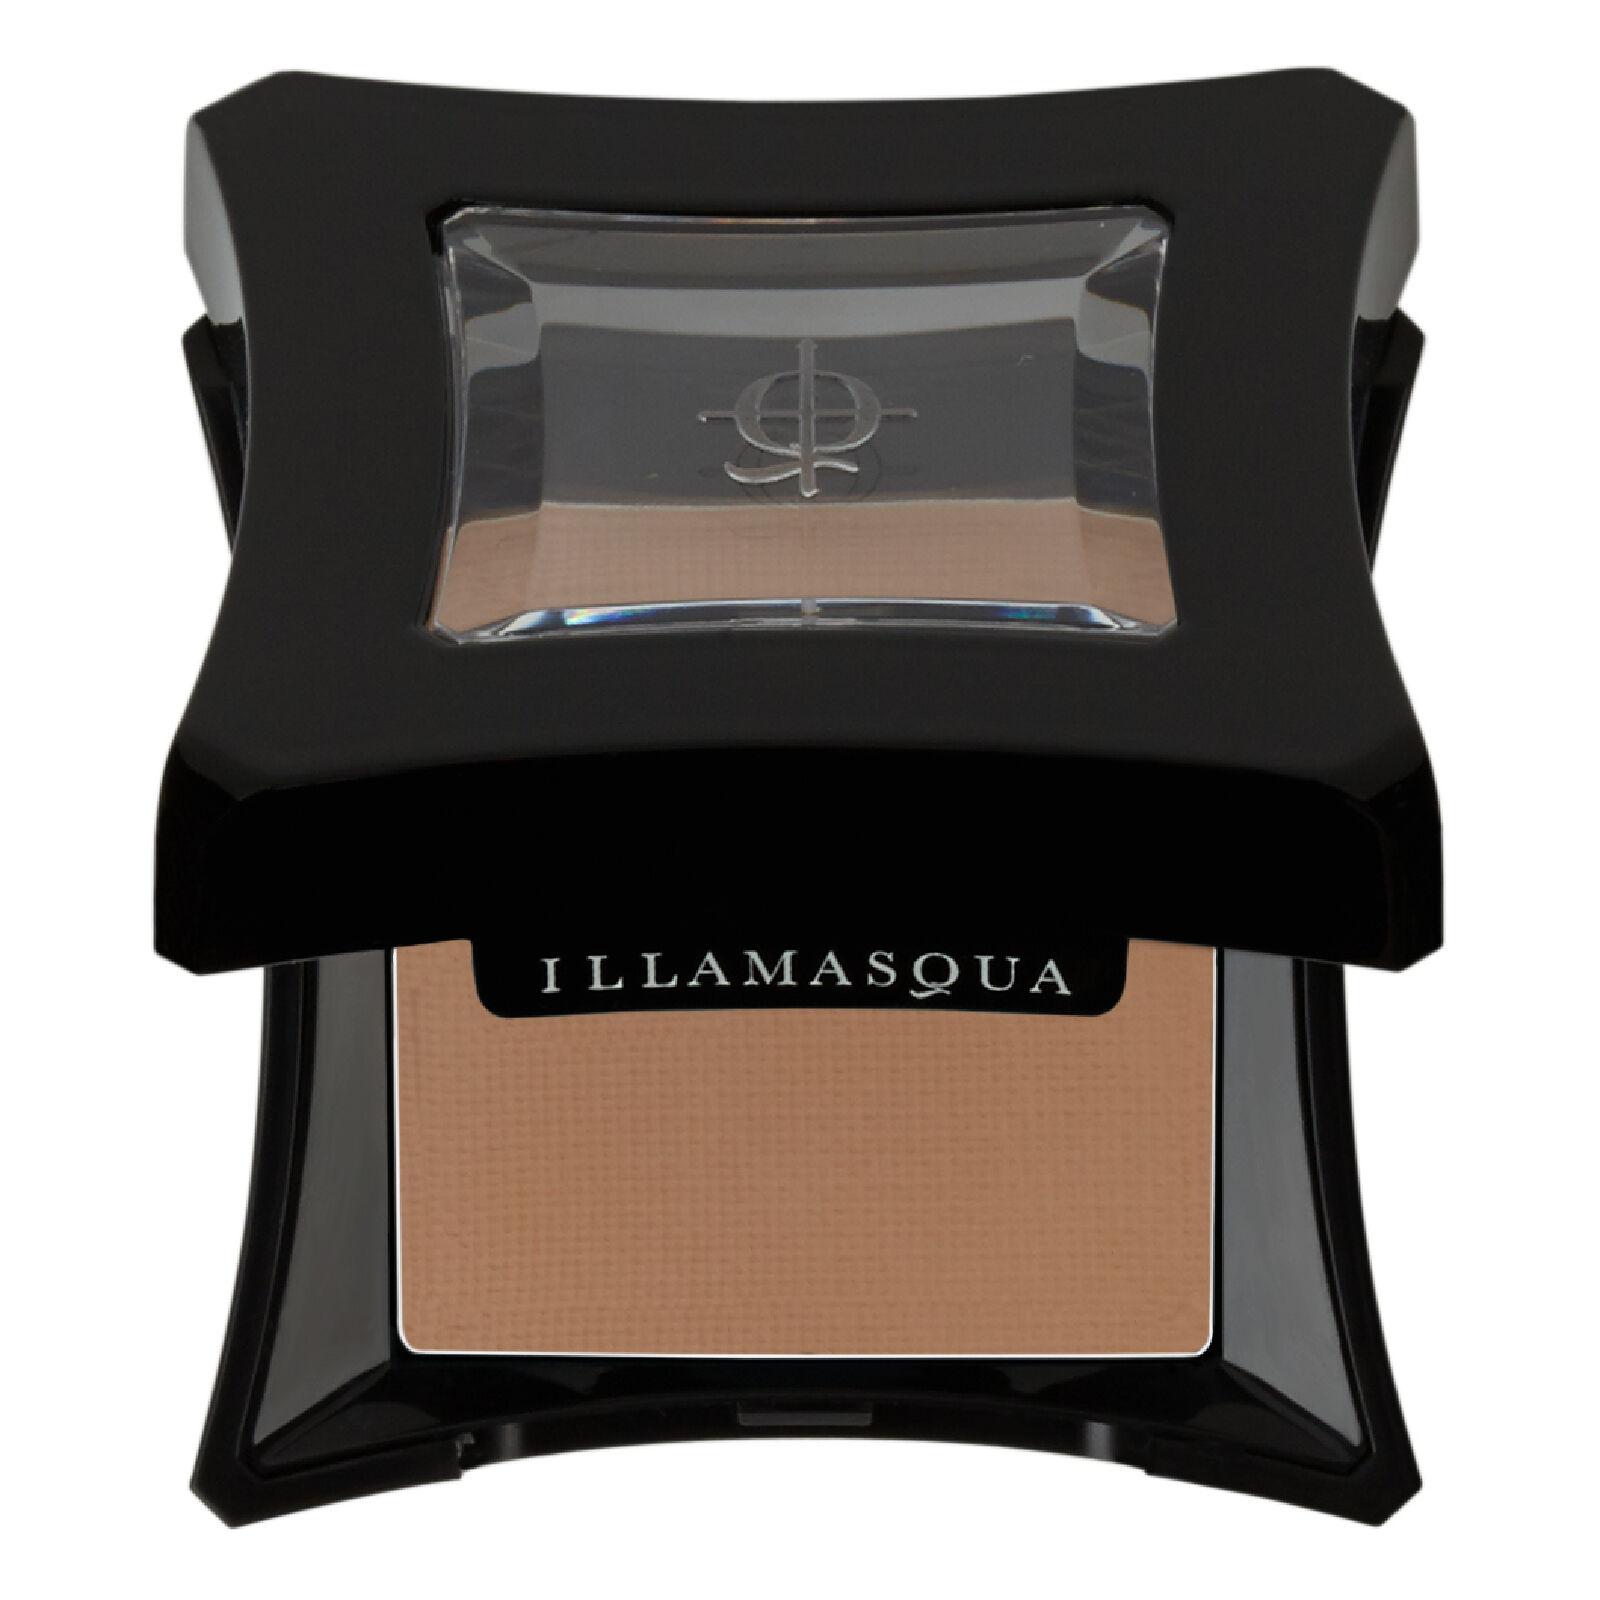 Illamasqua Powder Eye Shadow 2g (Various Shades) - Justify